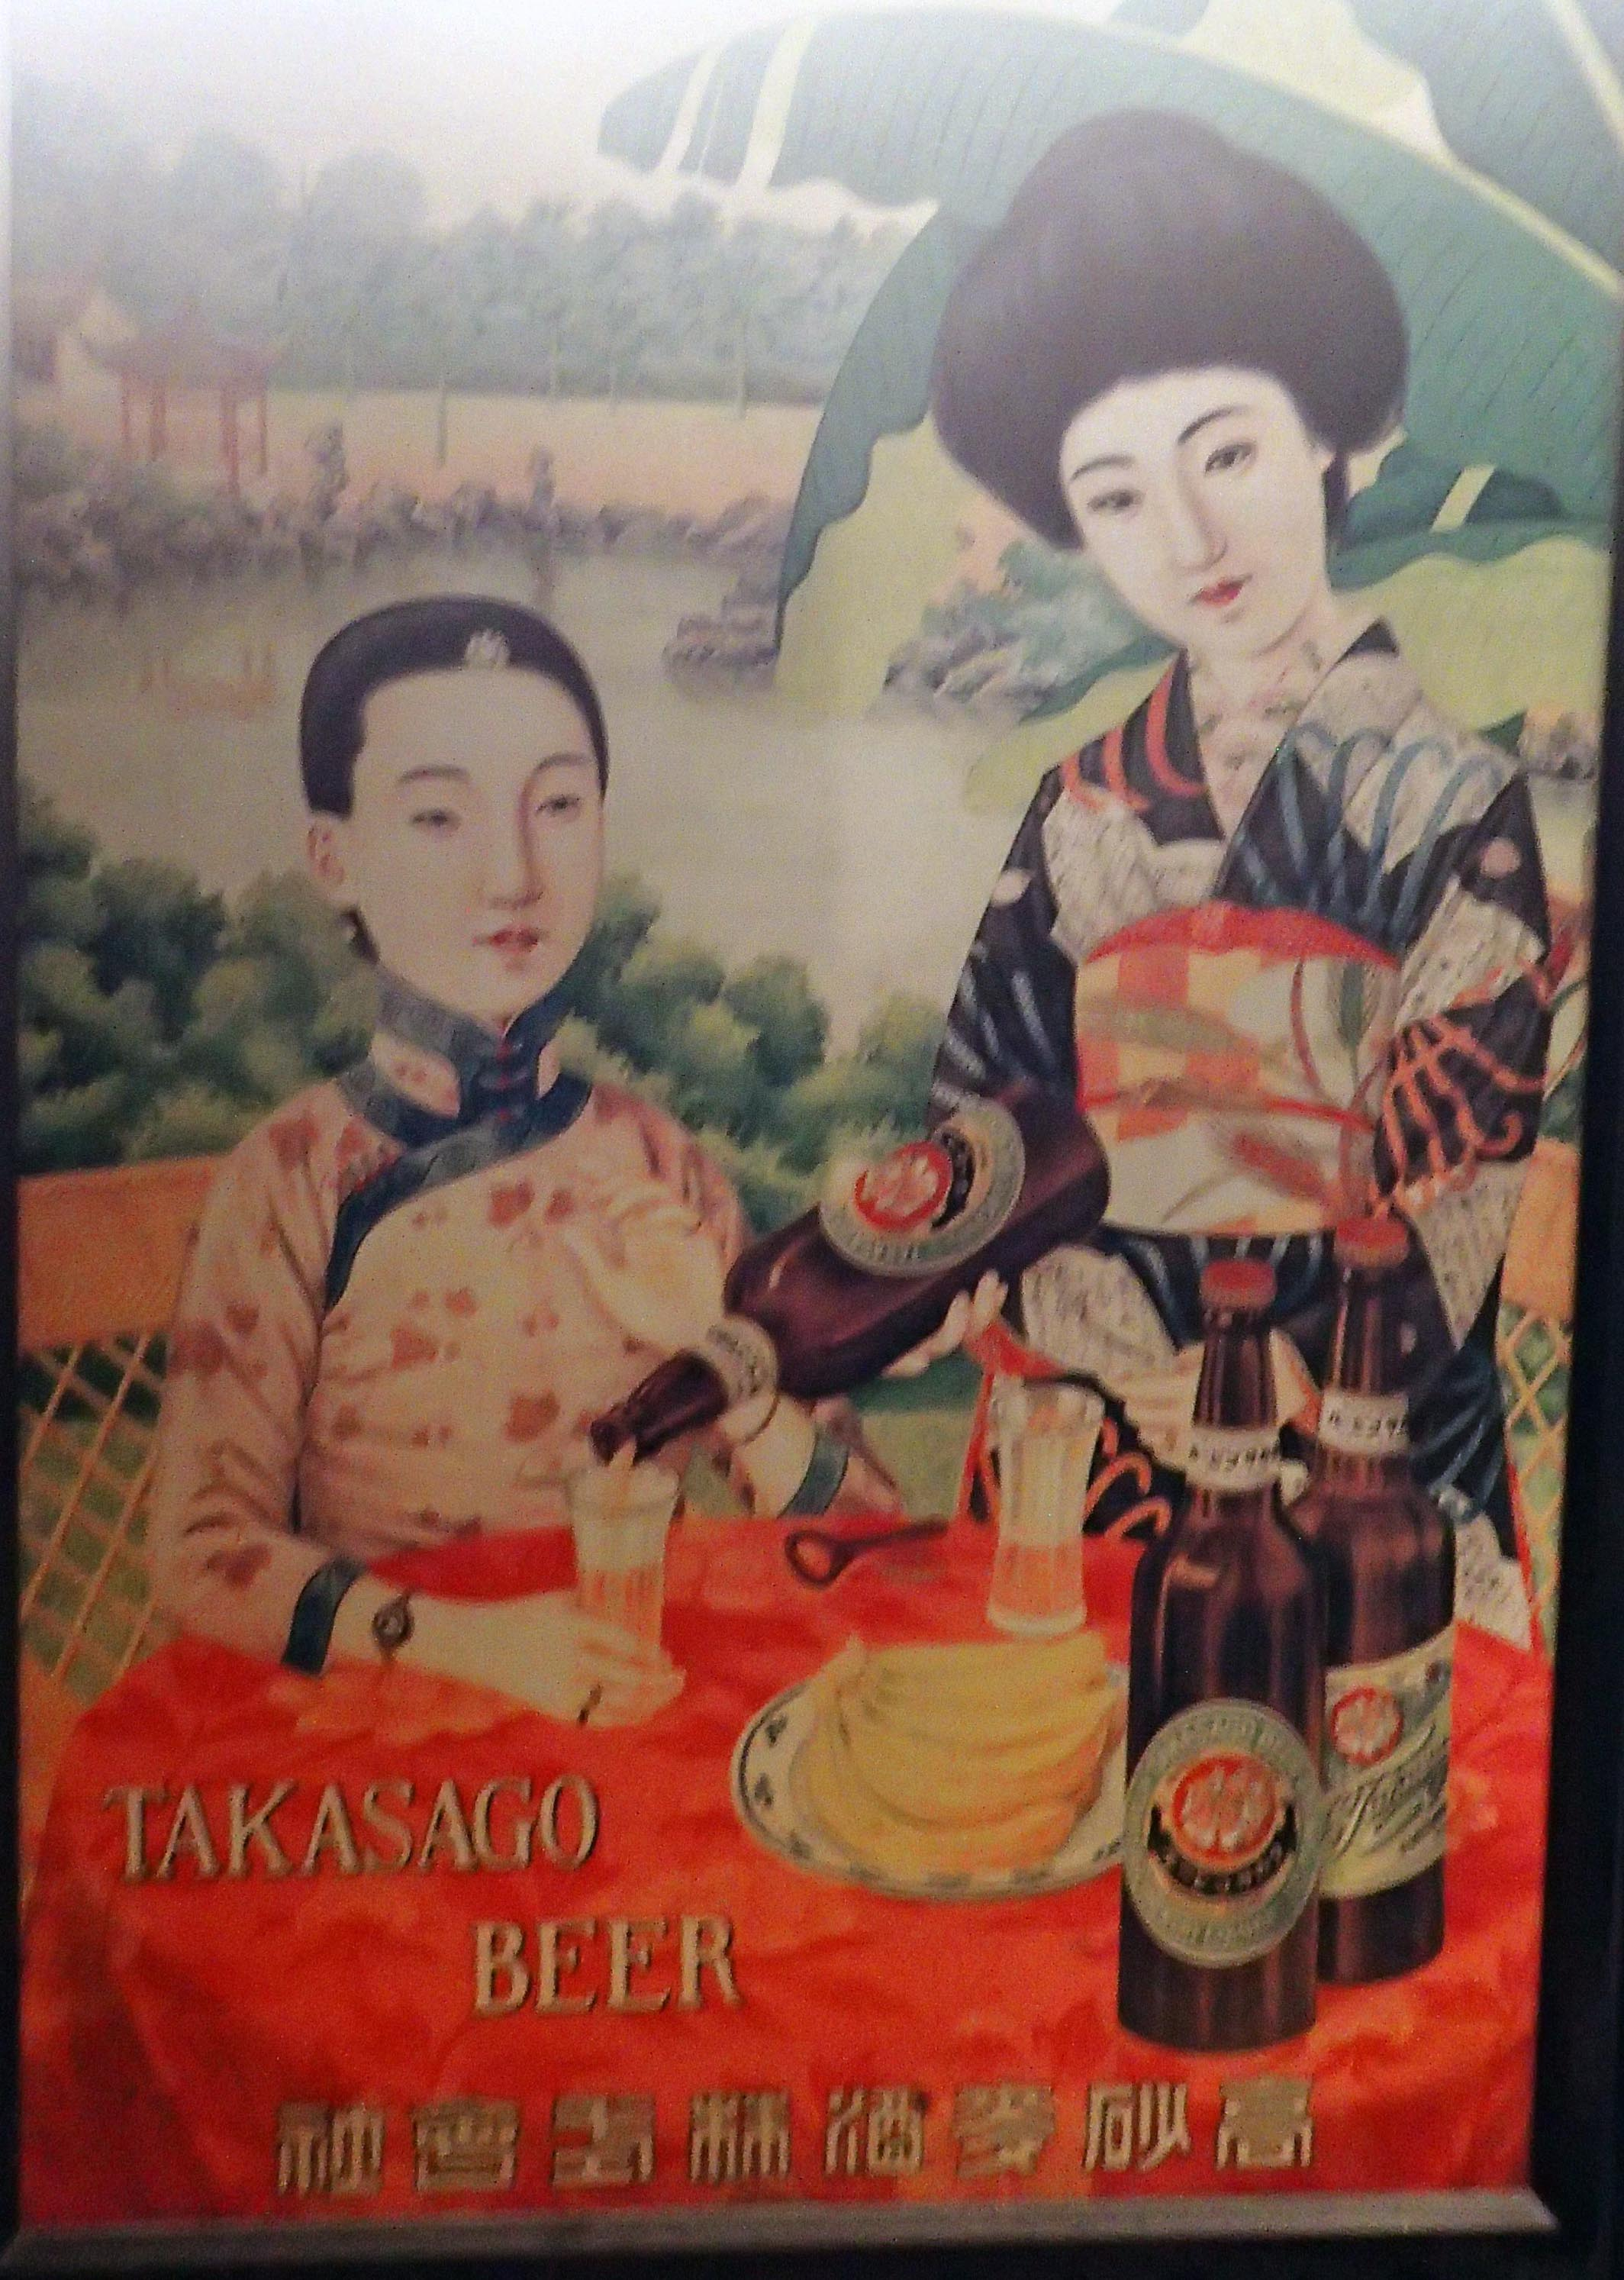 Taiwan's first beer.jpg